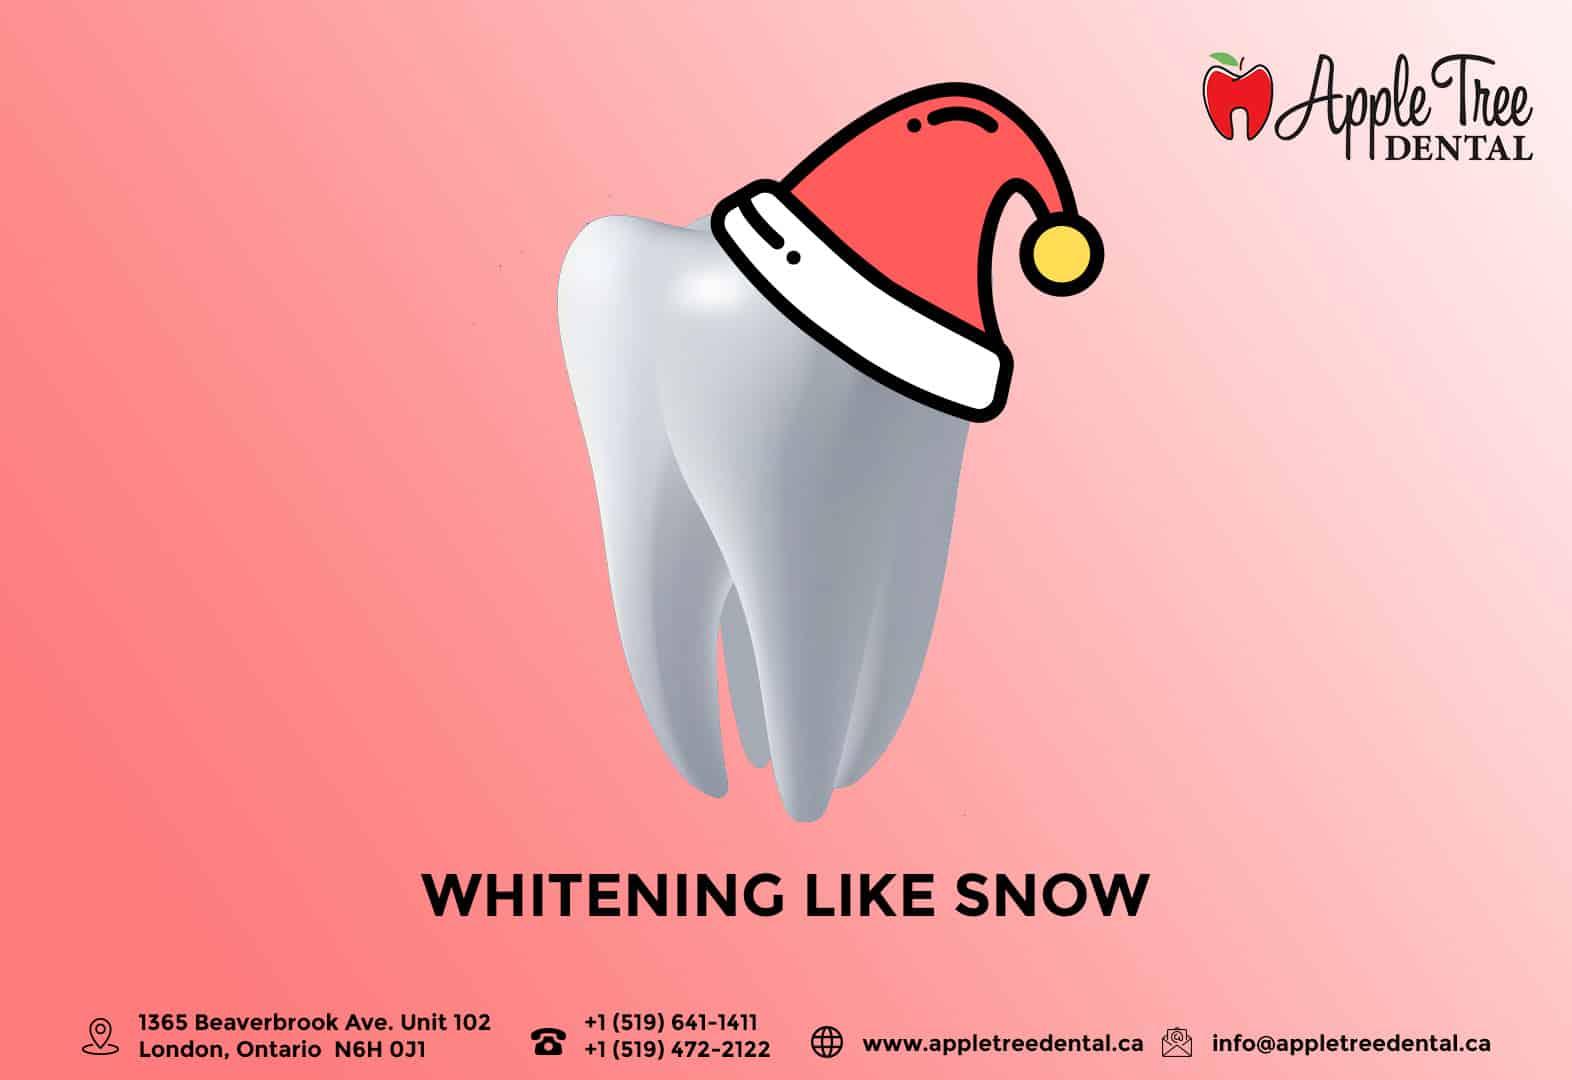 Tooth illustration wearing Santa hat